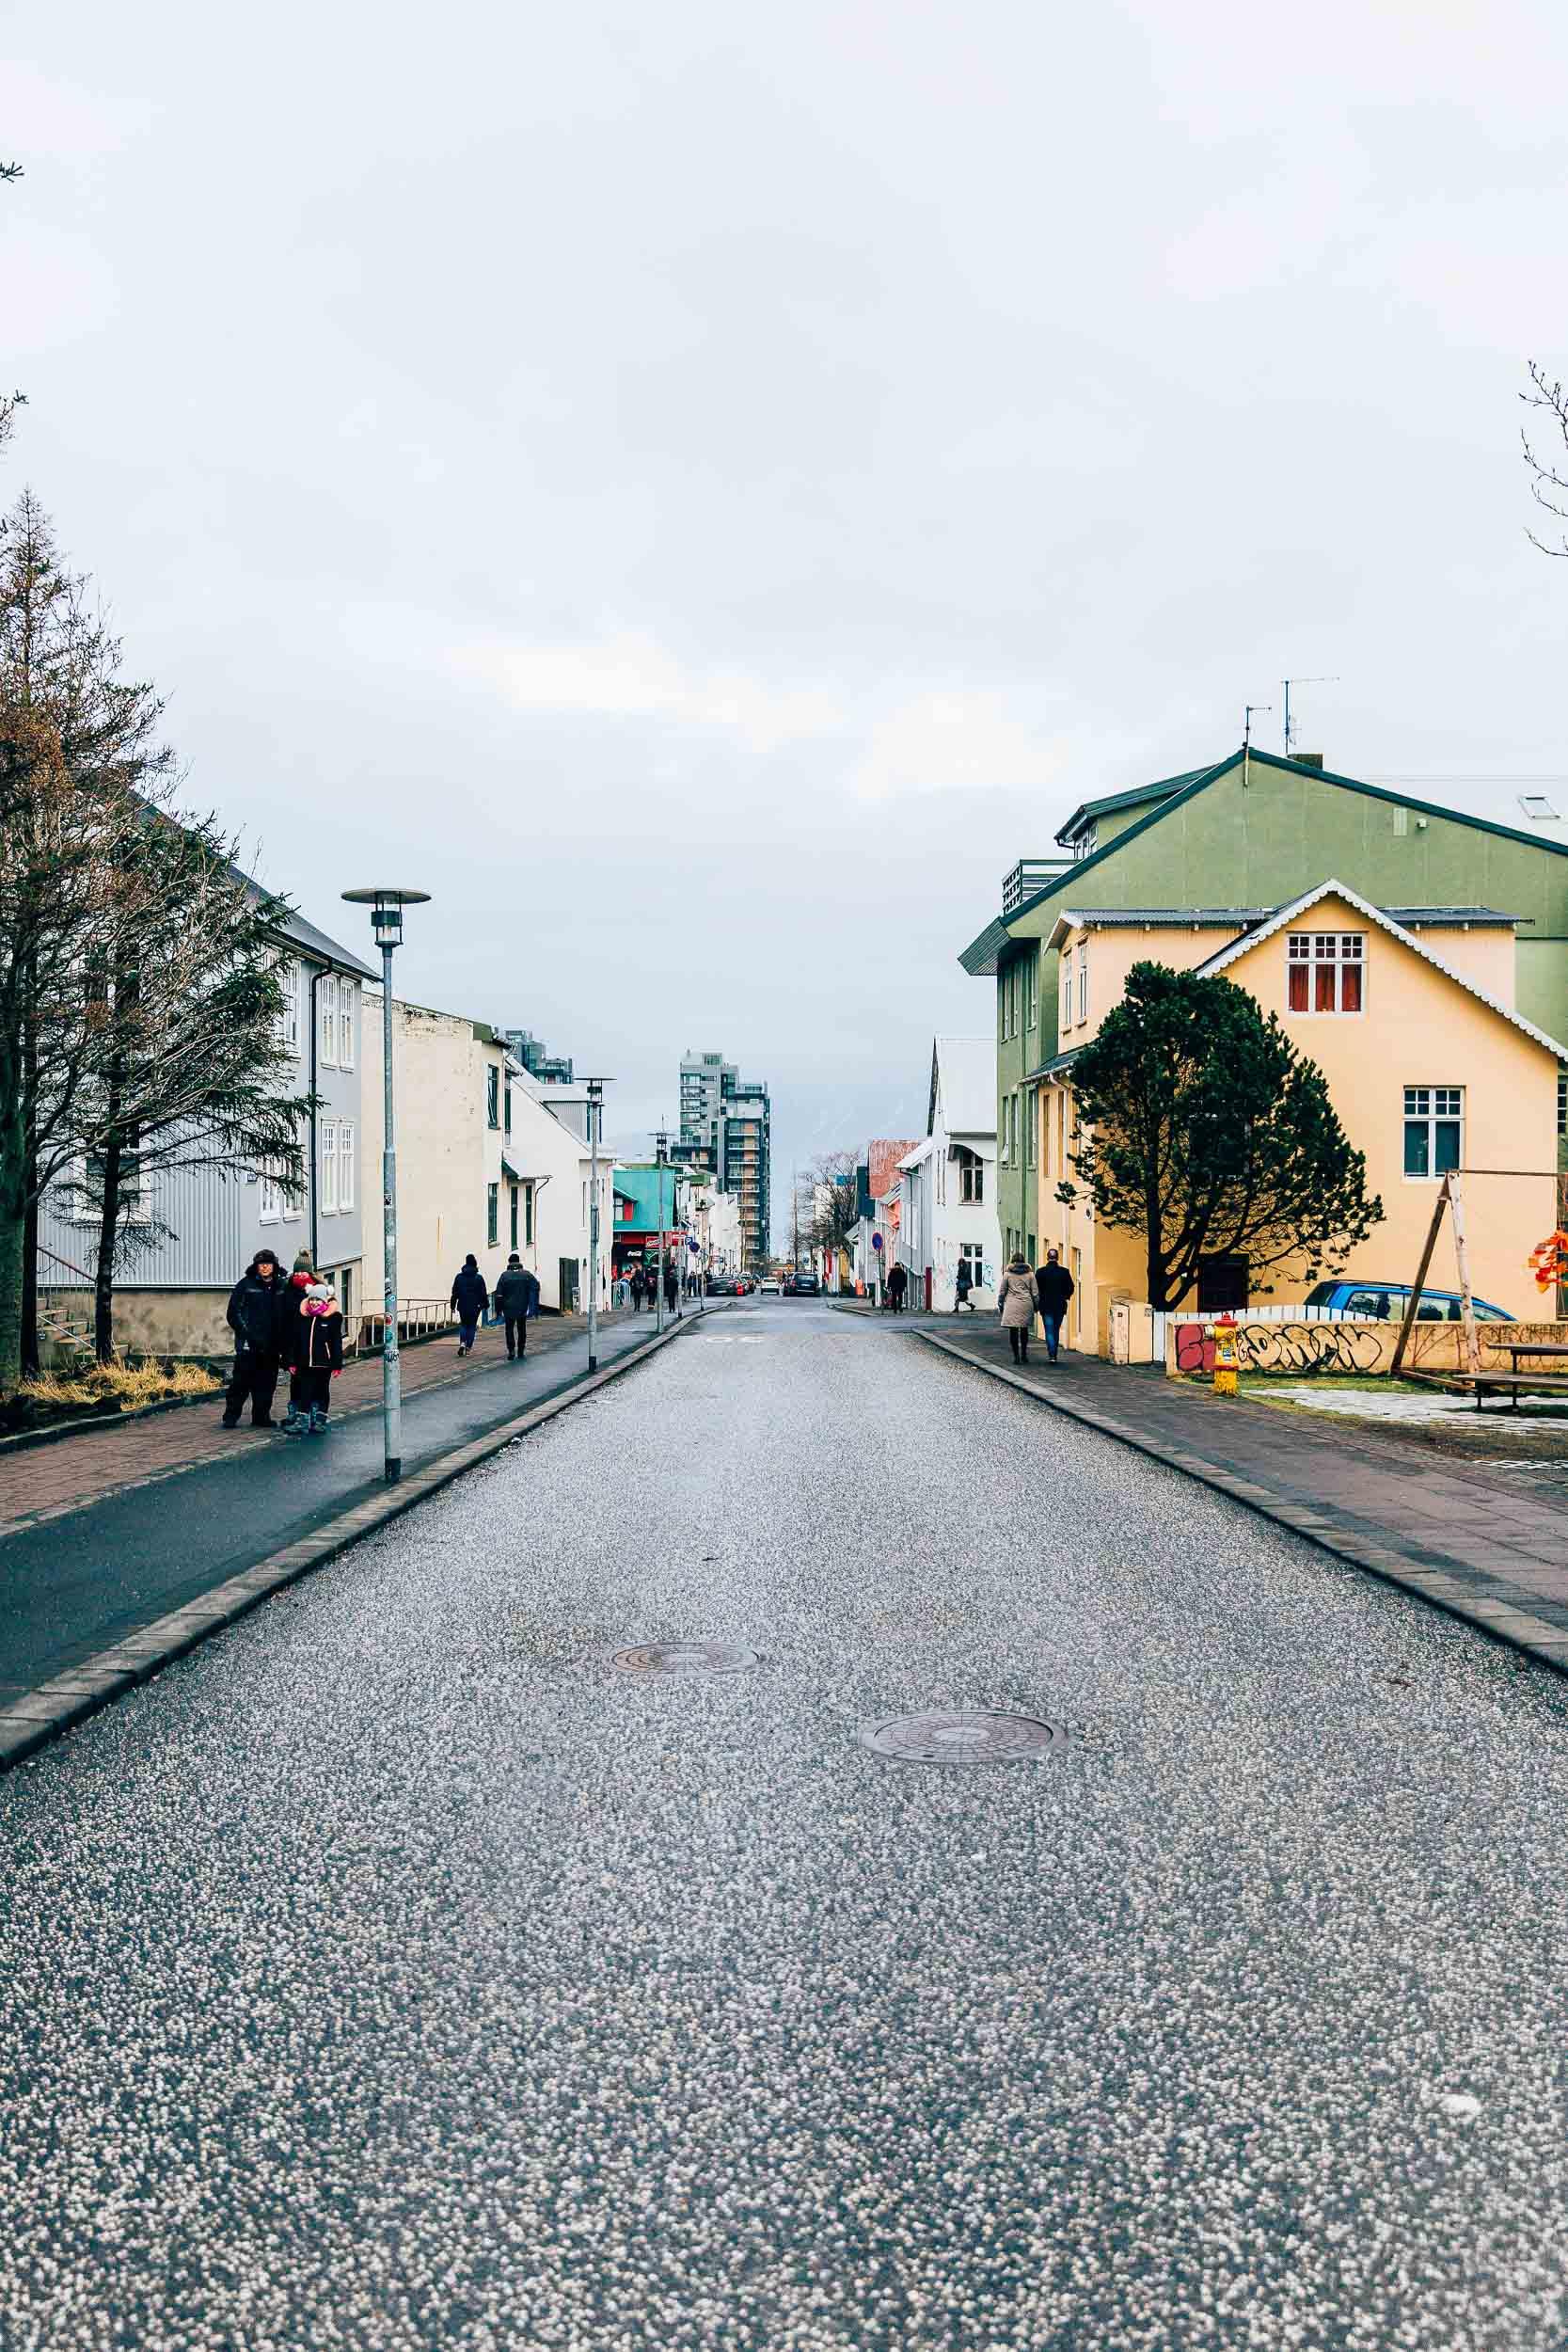 02_2019_Iceland-84.jpg